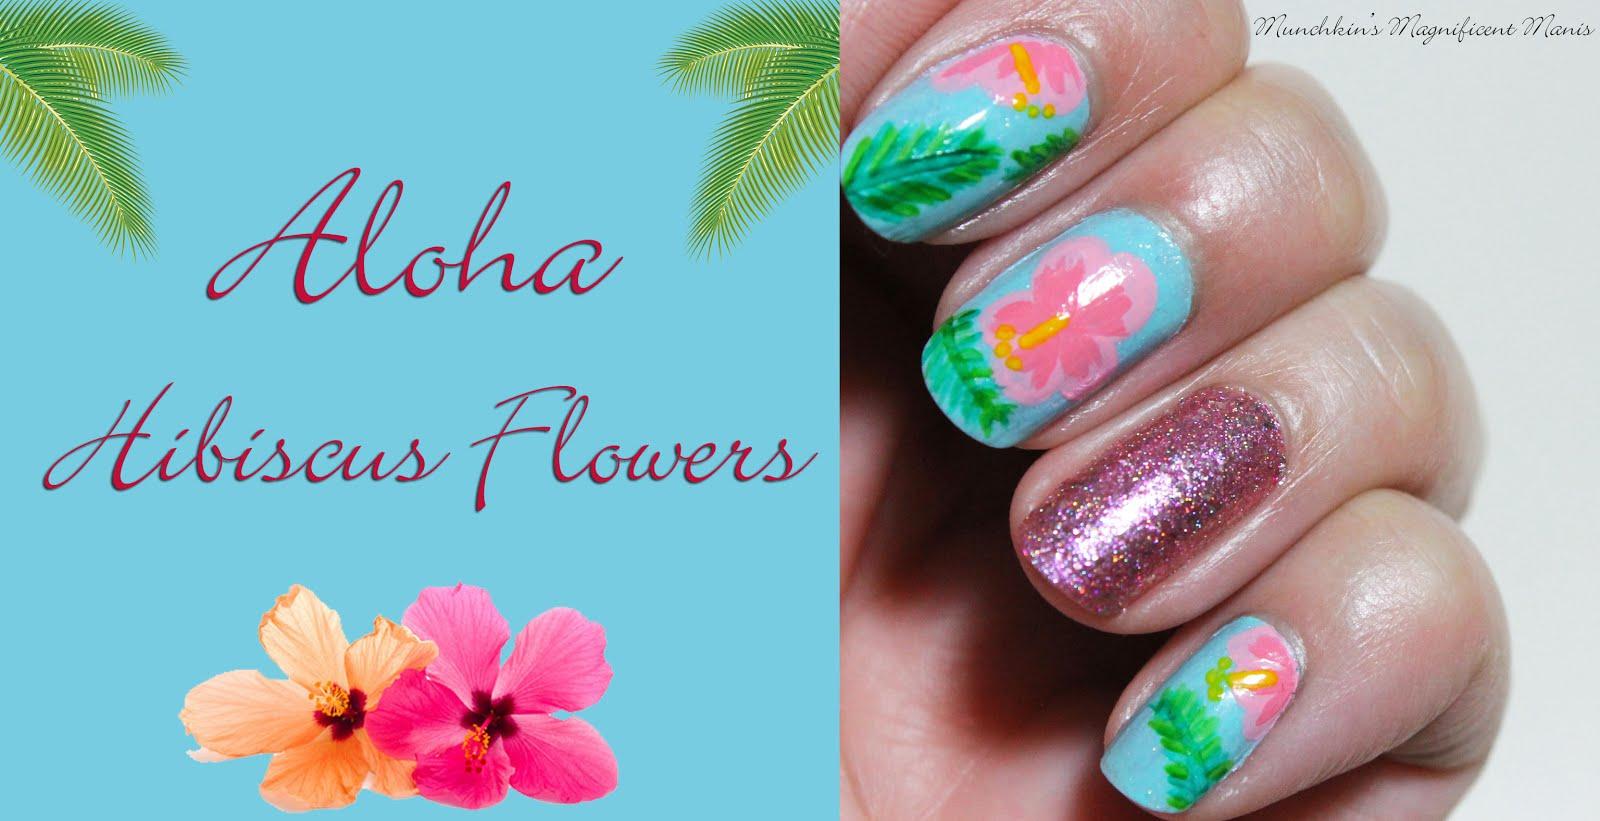 Munchkins magnificent manis aloha flowers hibiscus flower nail design hibiscus flower nail design izmirmasajfo